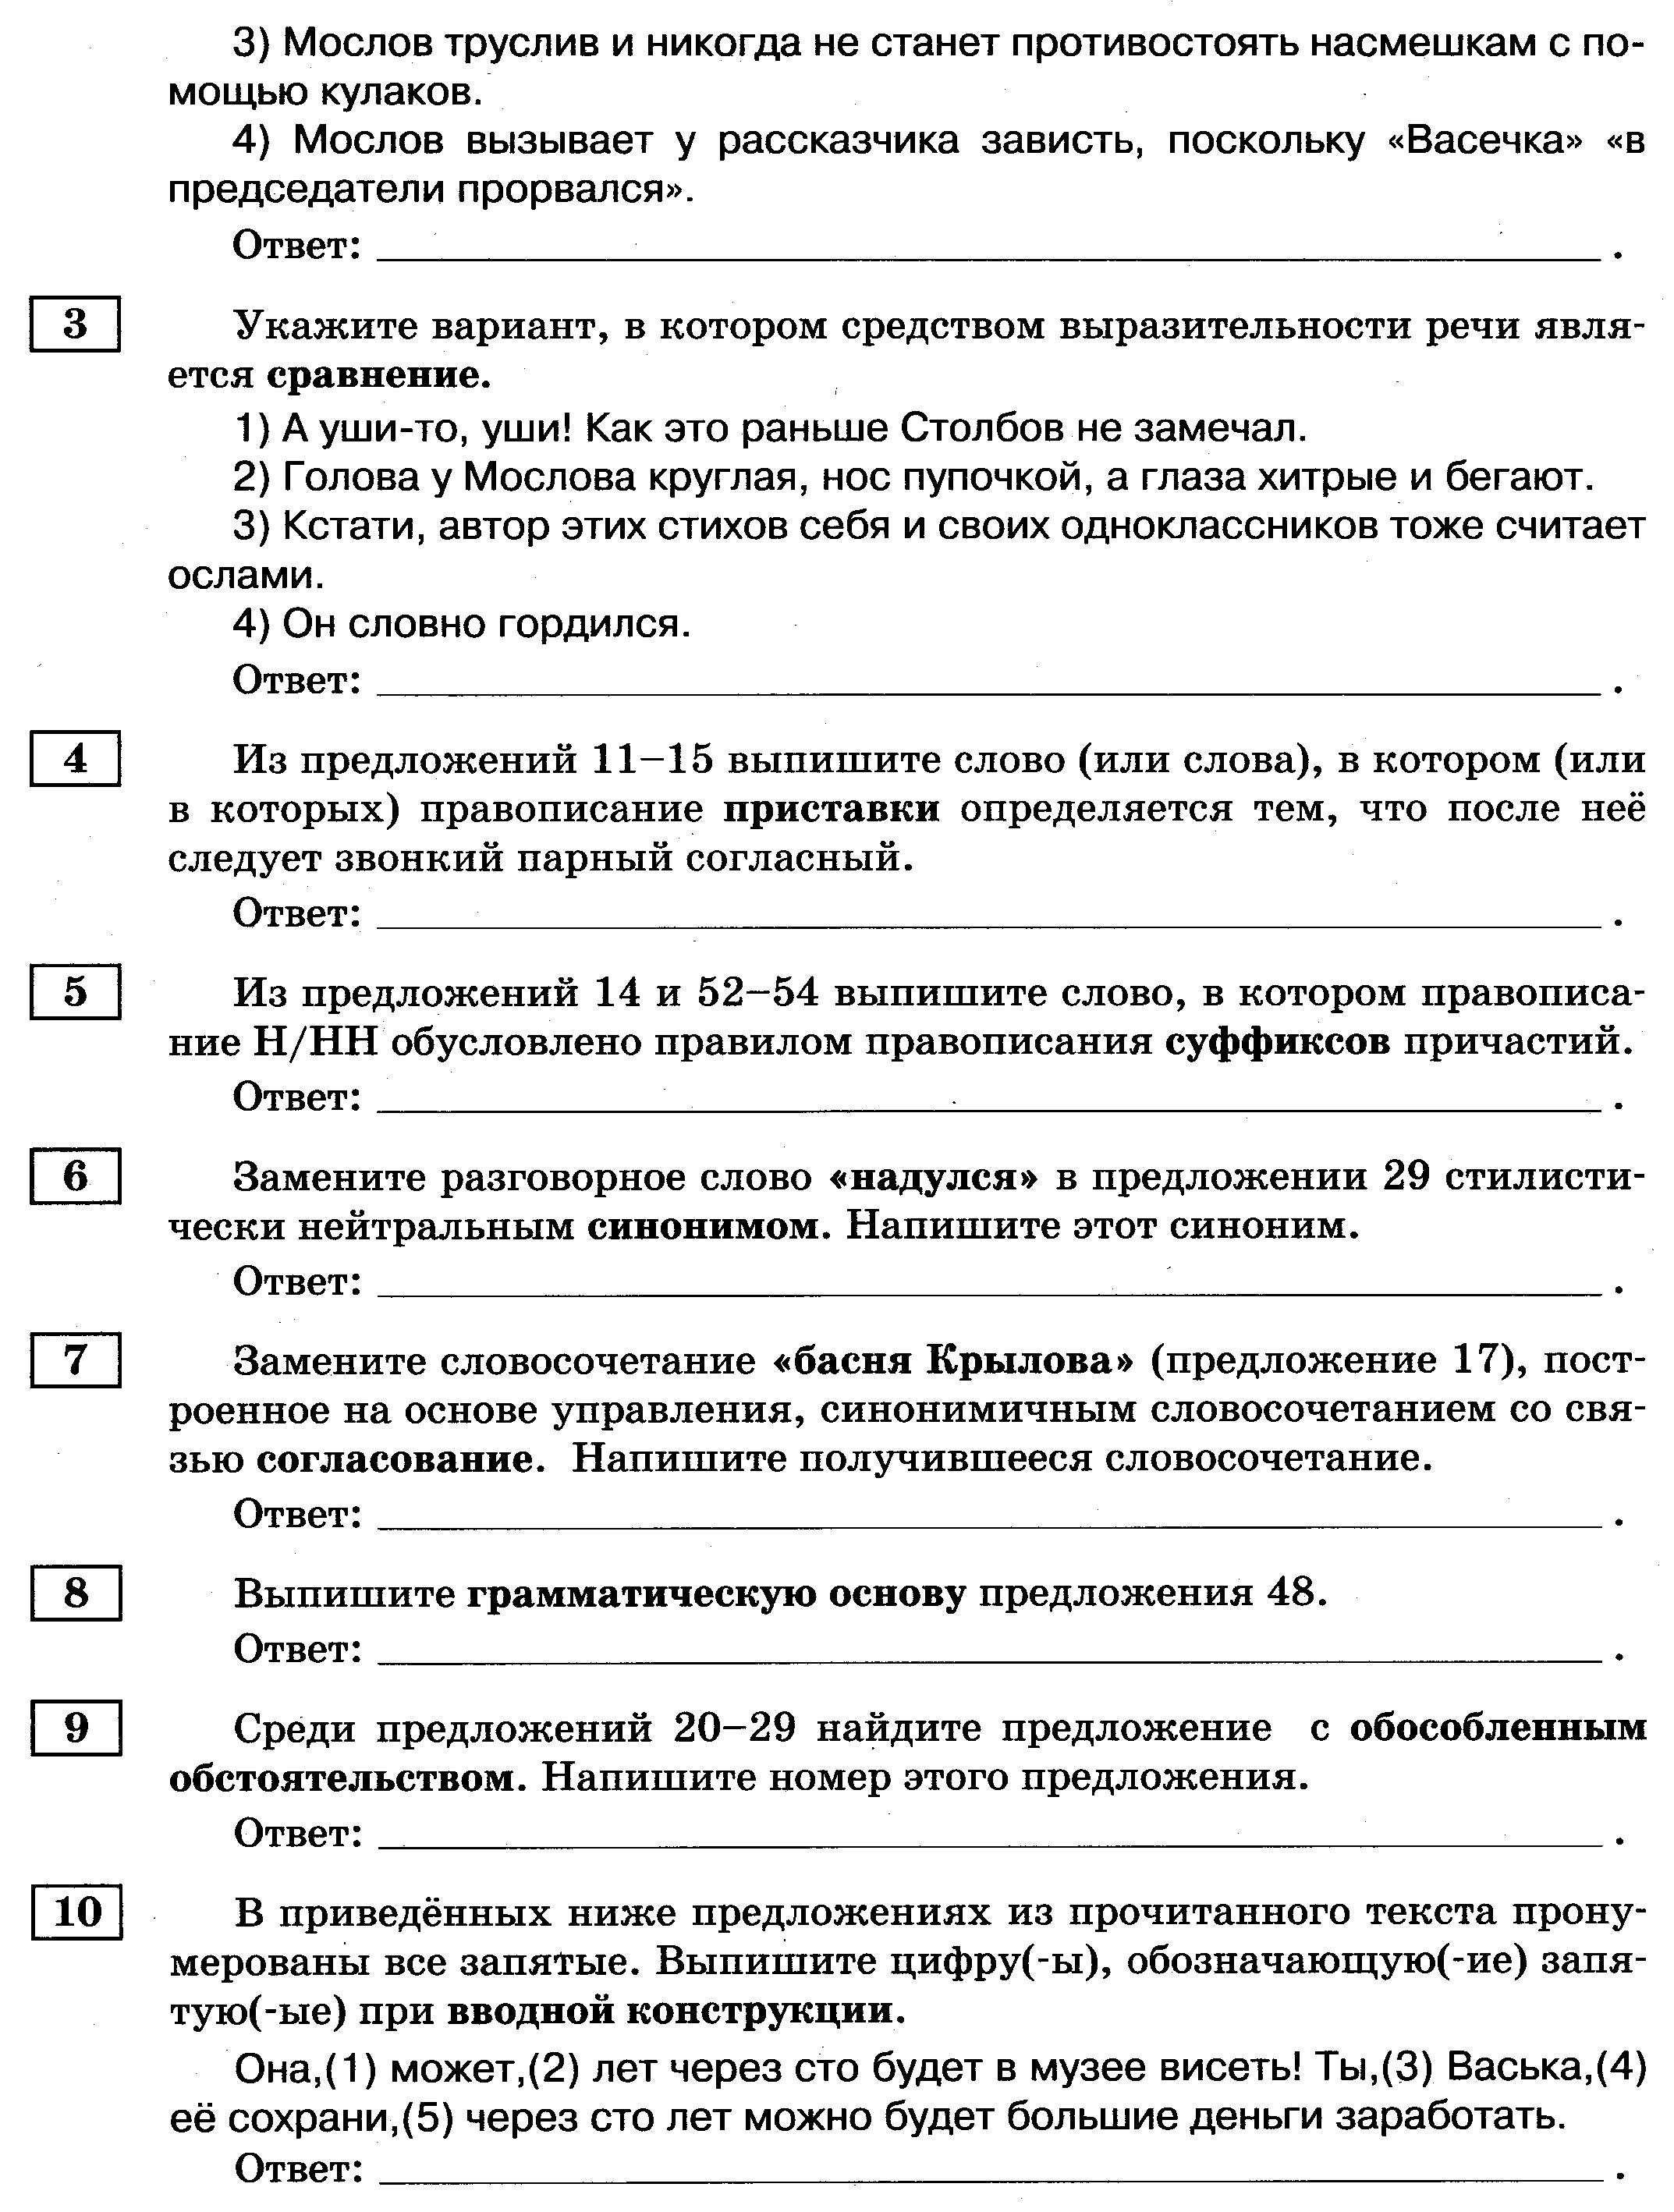 C:\Documents and Settings\Наташа\Рабочий стол\ОГЭ 2016\КИМы Степановой ОГЭ-2016\img296.jpg